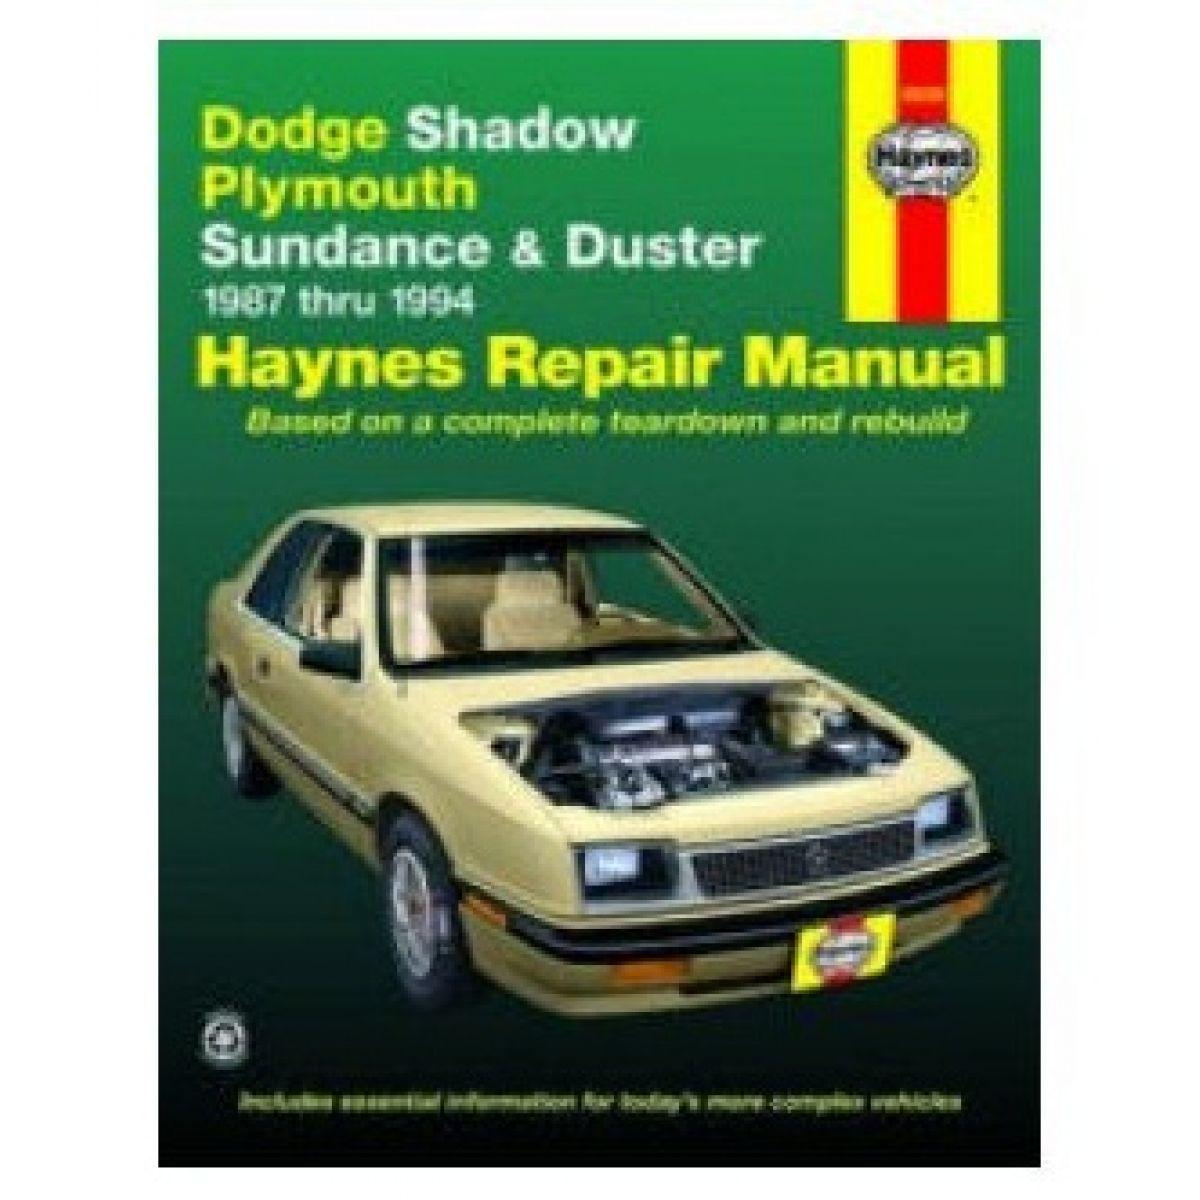 Haynes Repair Manual for 1987-1994 Shadow Duster Sundance